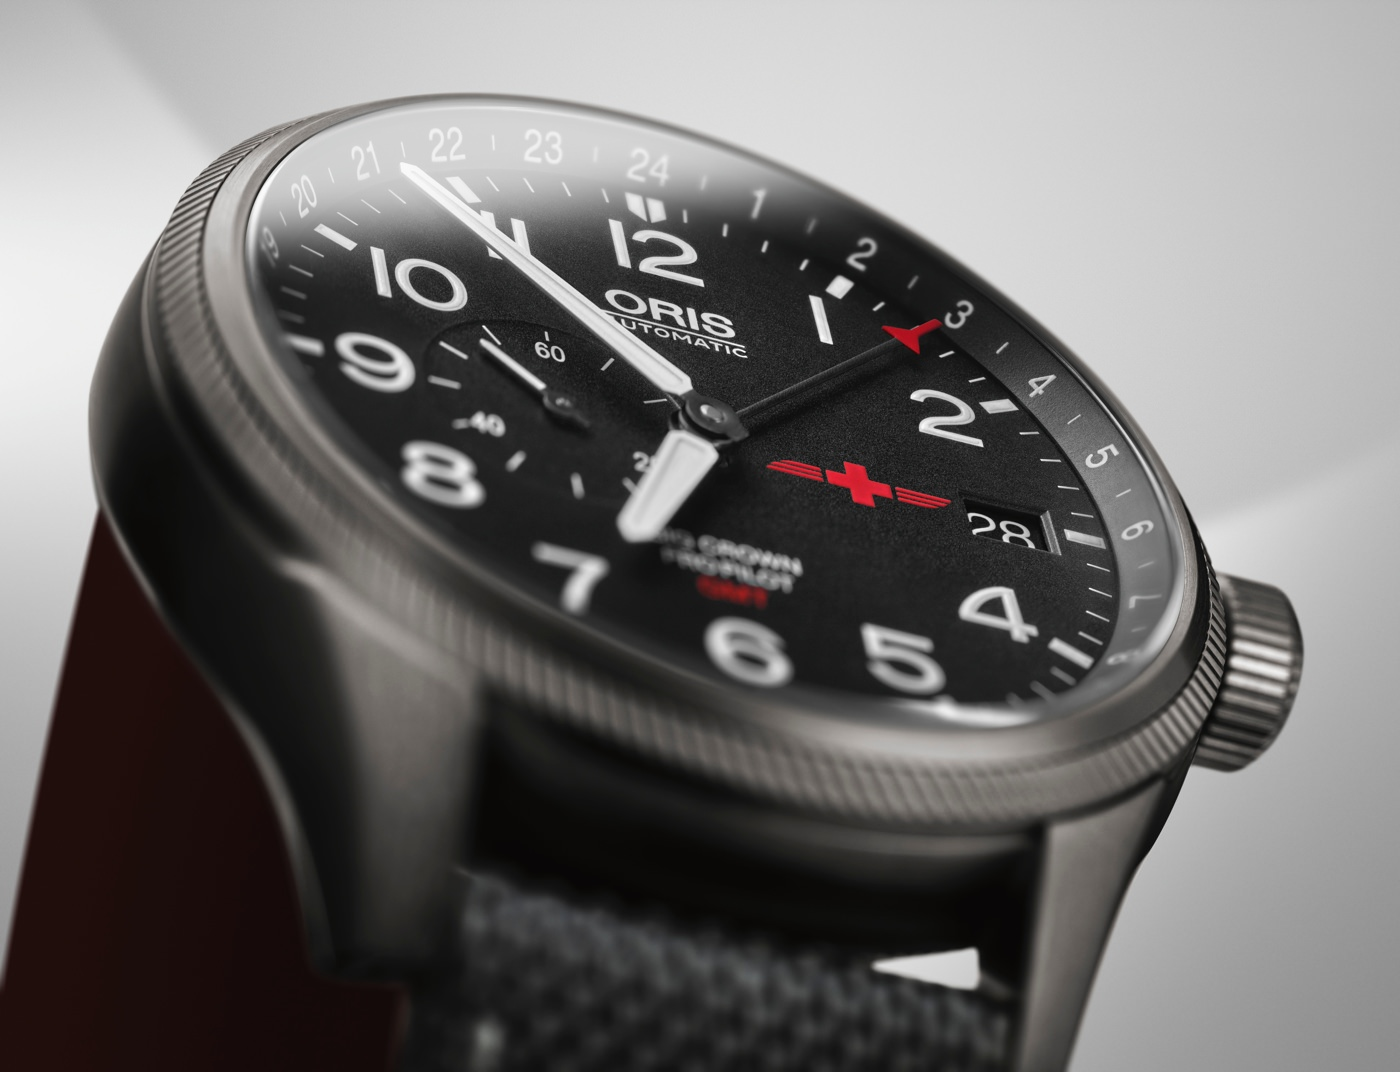 Oris timepieces